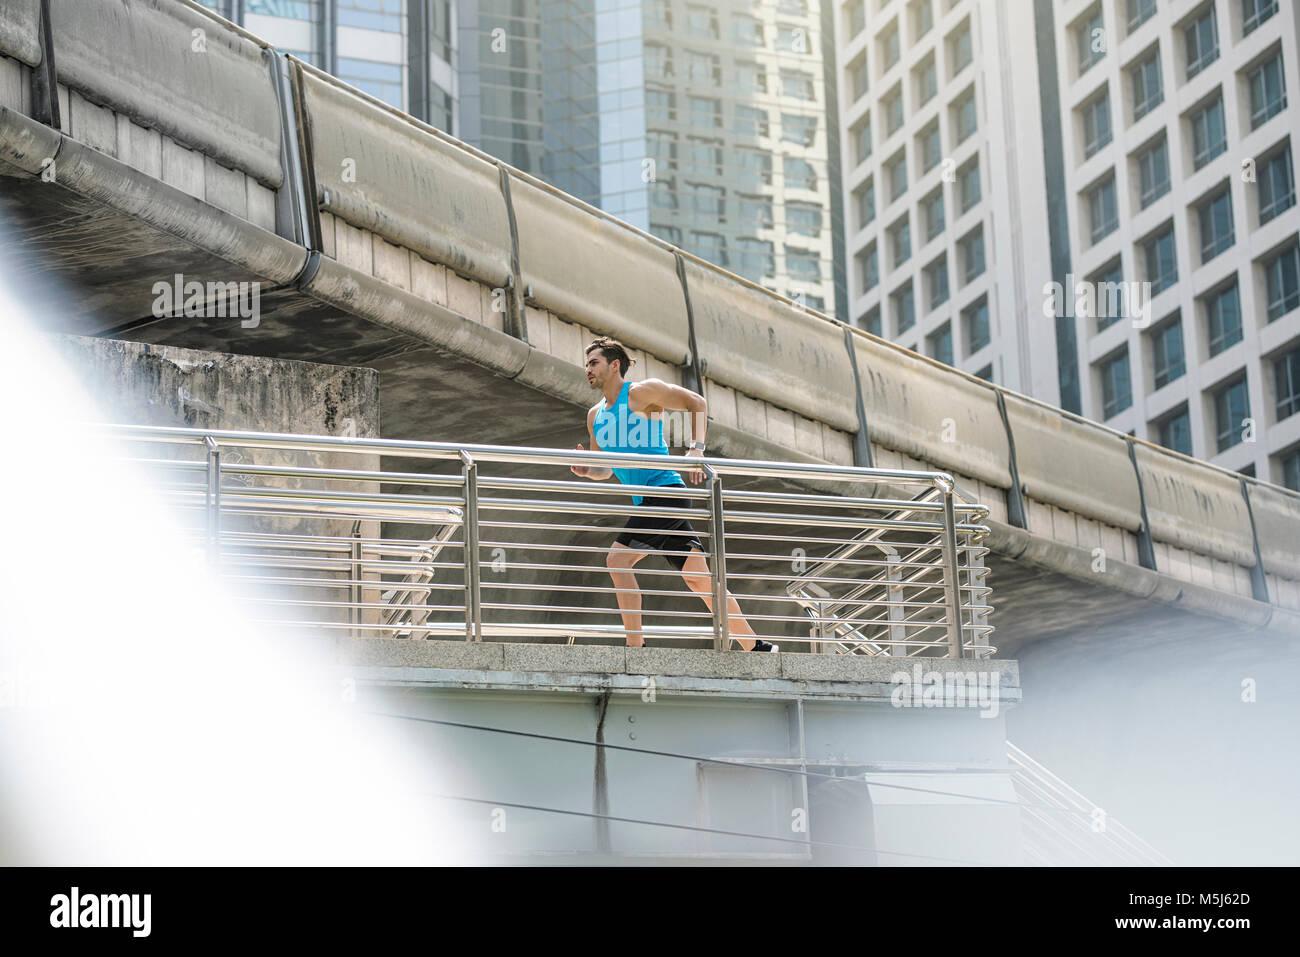 Runner en Azul Camiseta Gimnasia ejecutando más moderno puente Imagen De Stock